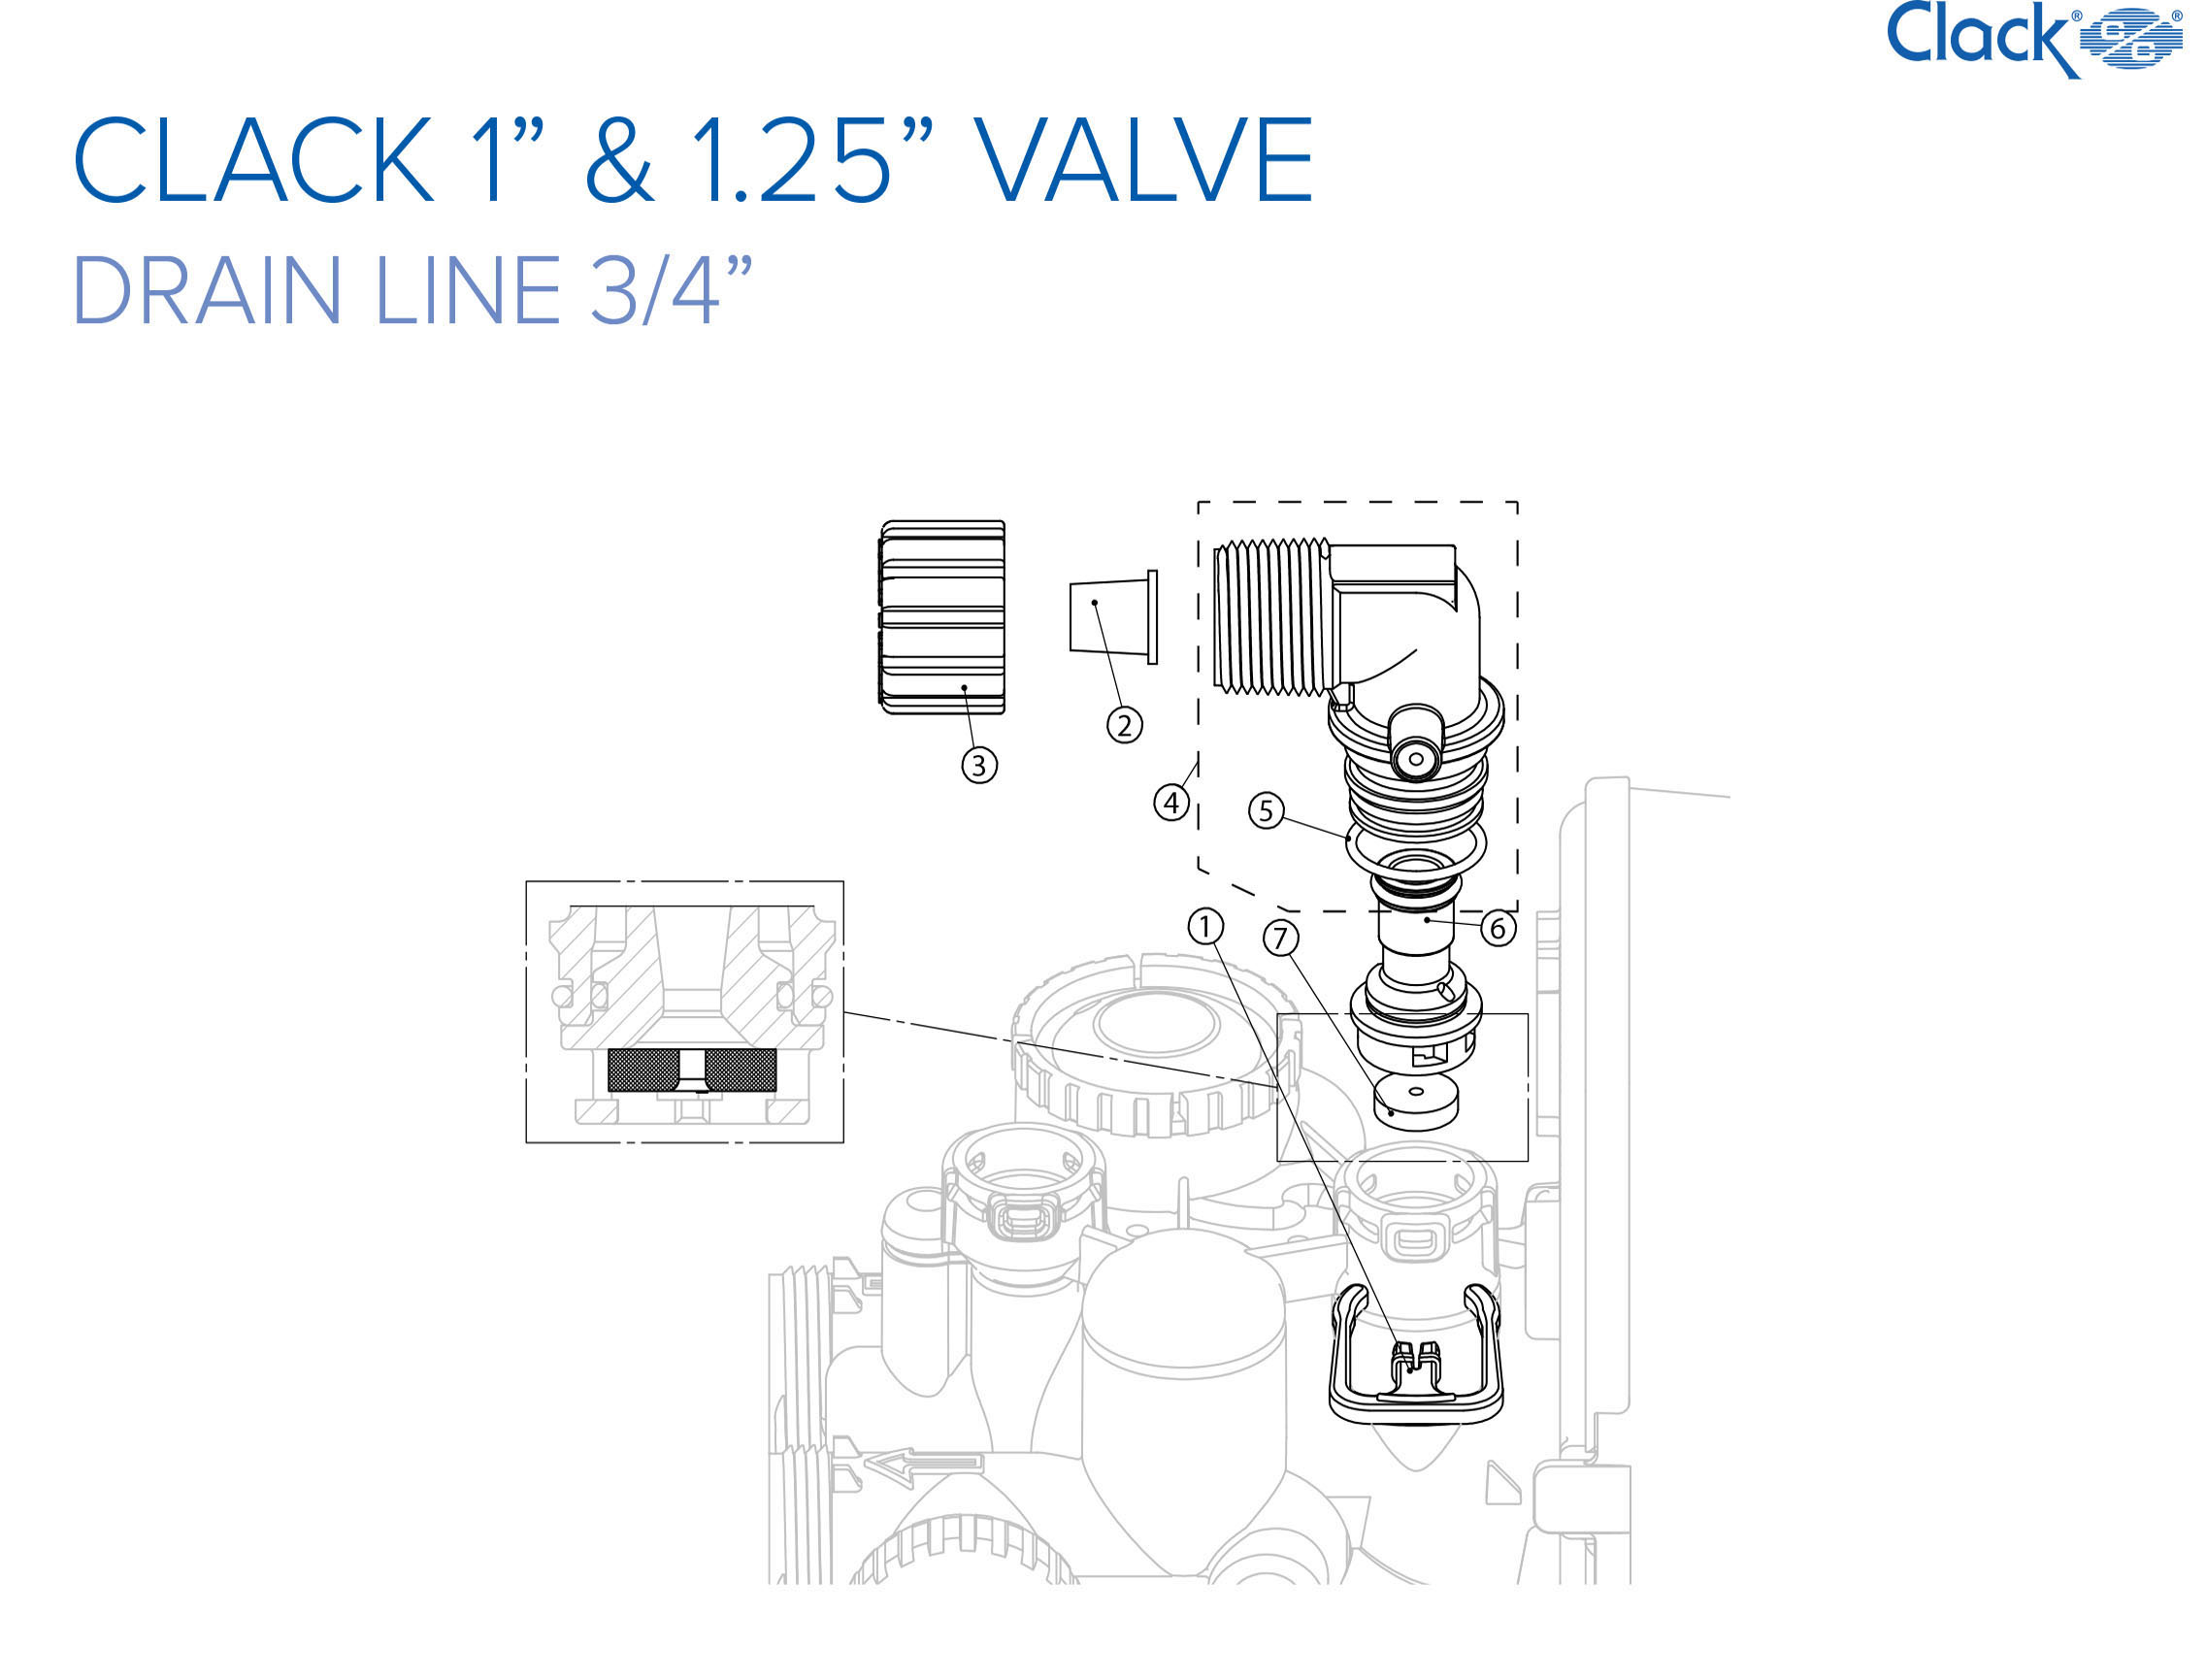 "*** NEW *** Clack Spare Parts - Drain line 3/4"""